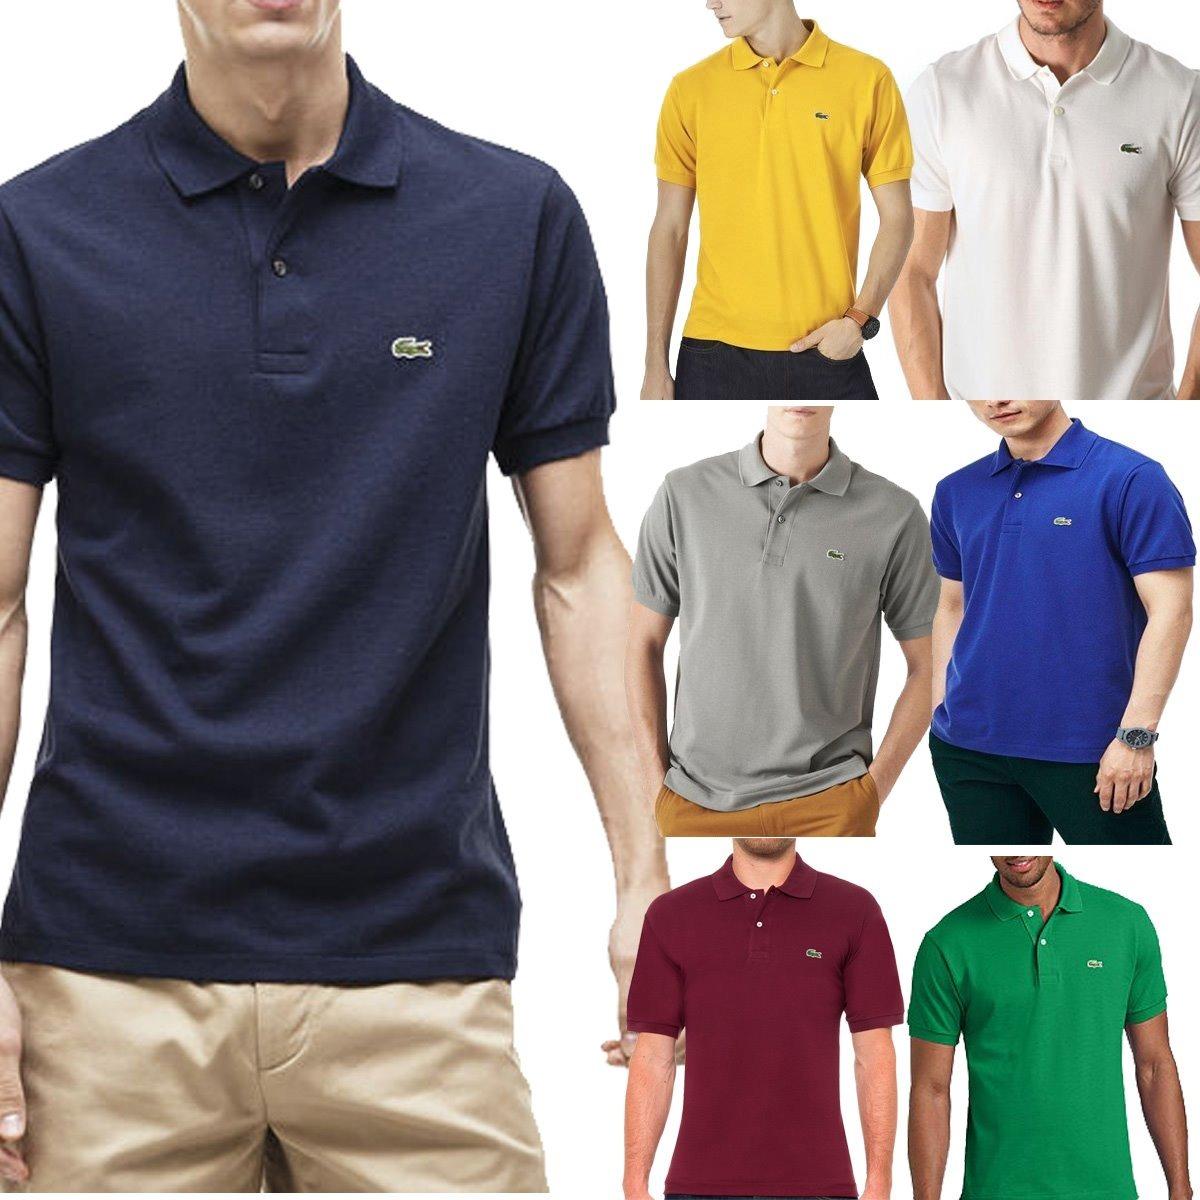 Kit 10 Camisas Polo Masculina Camiseta Blusa De Luxo Atacado - R ... 1f28f3366c655